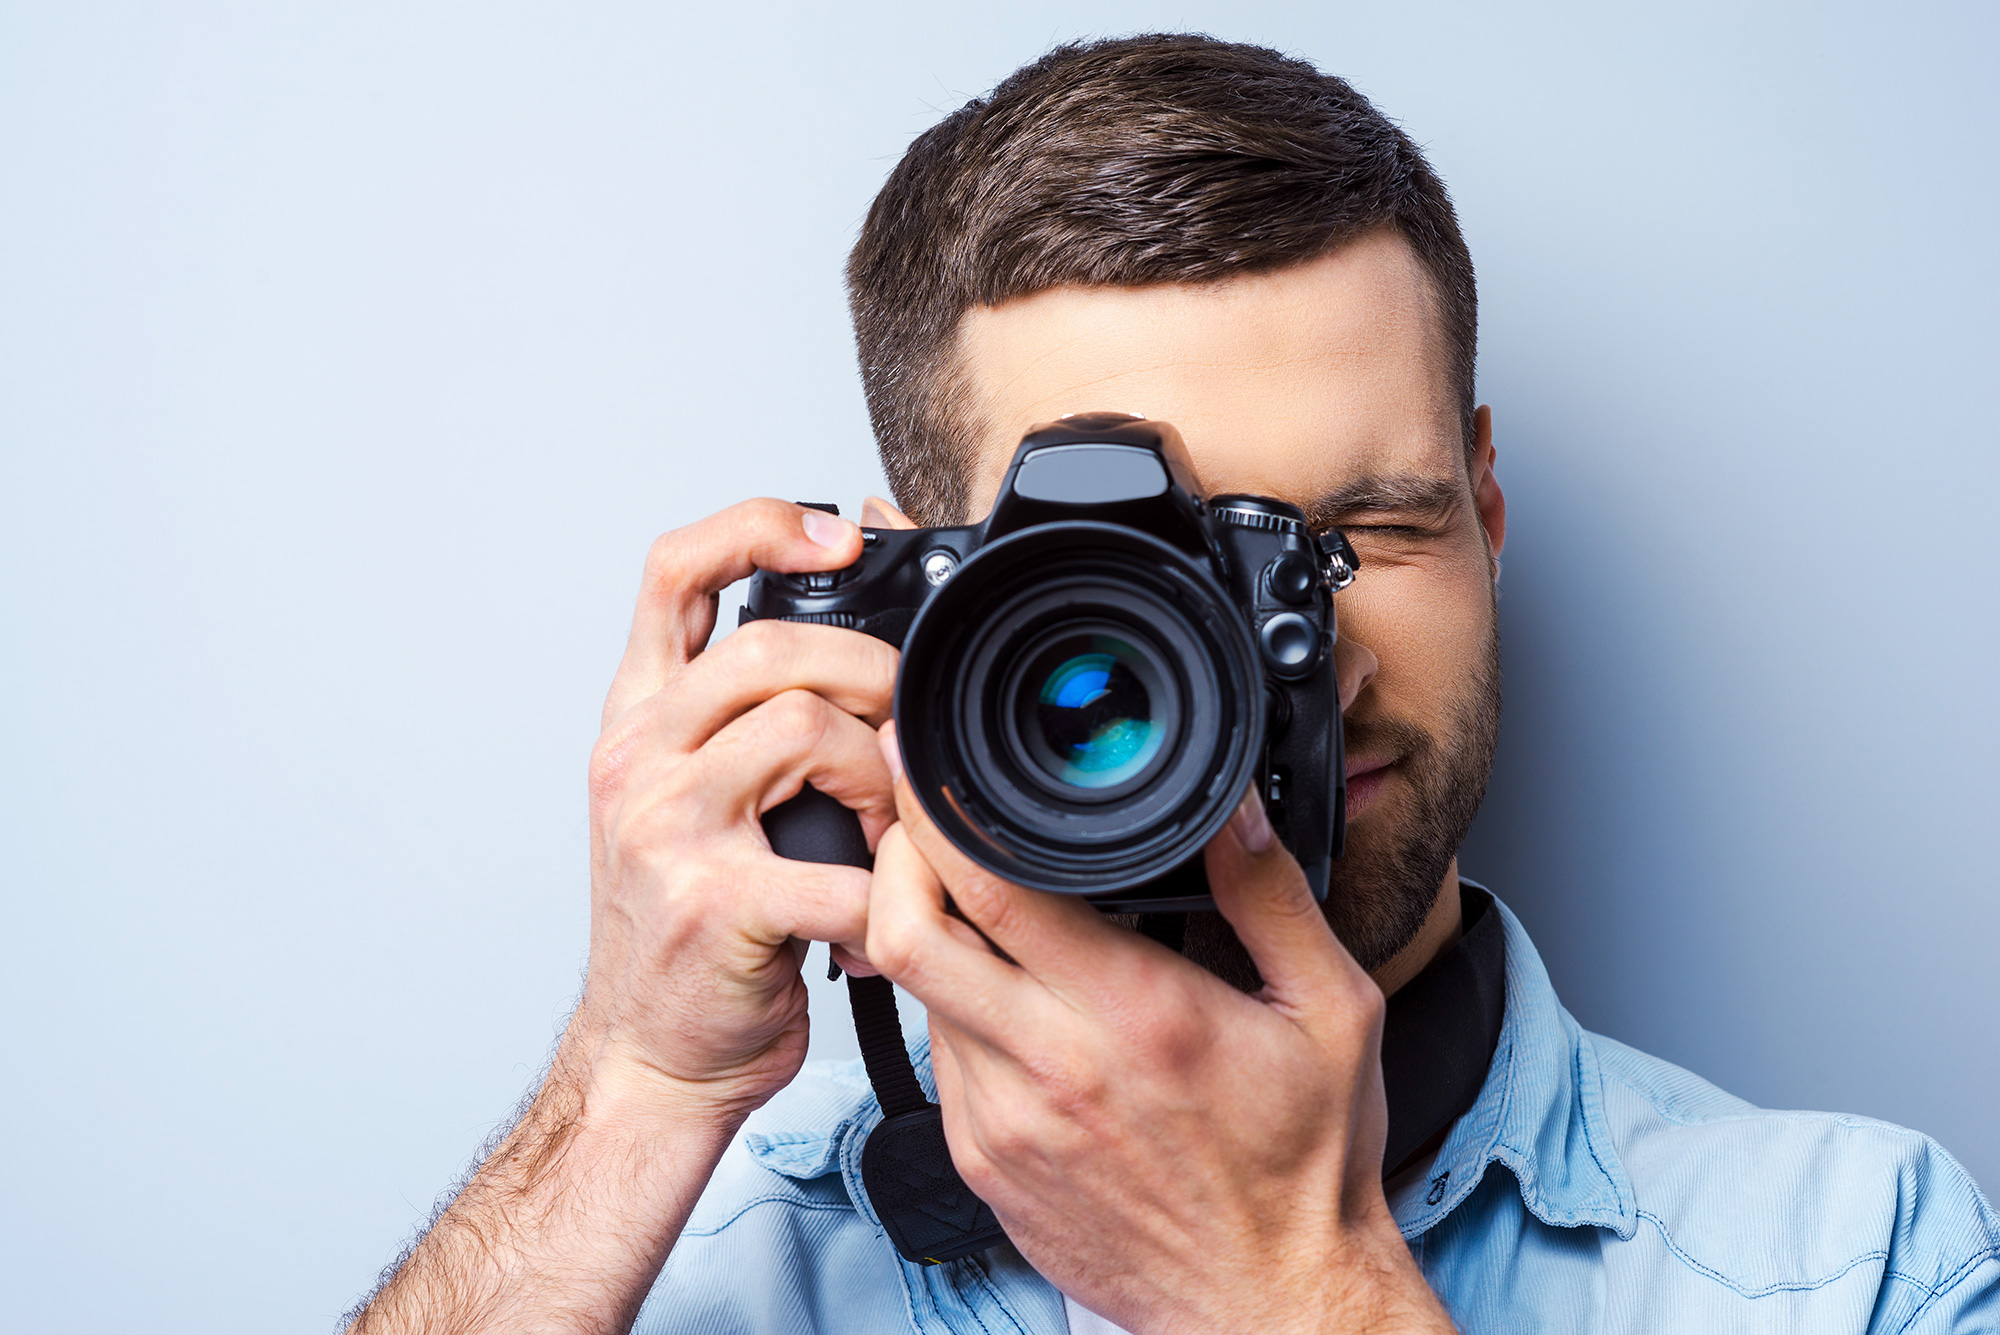 yardley-arts-photography-classes-northamptonshire.jpg